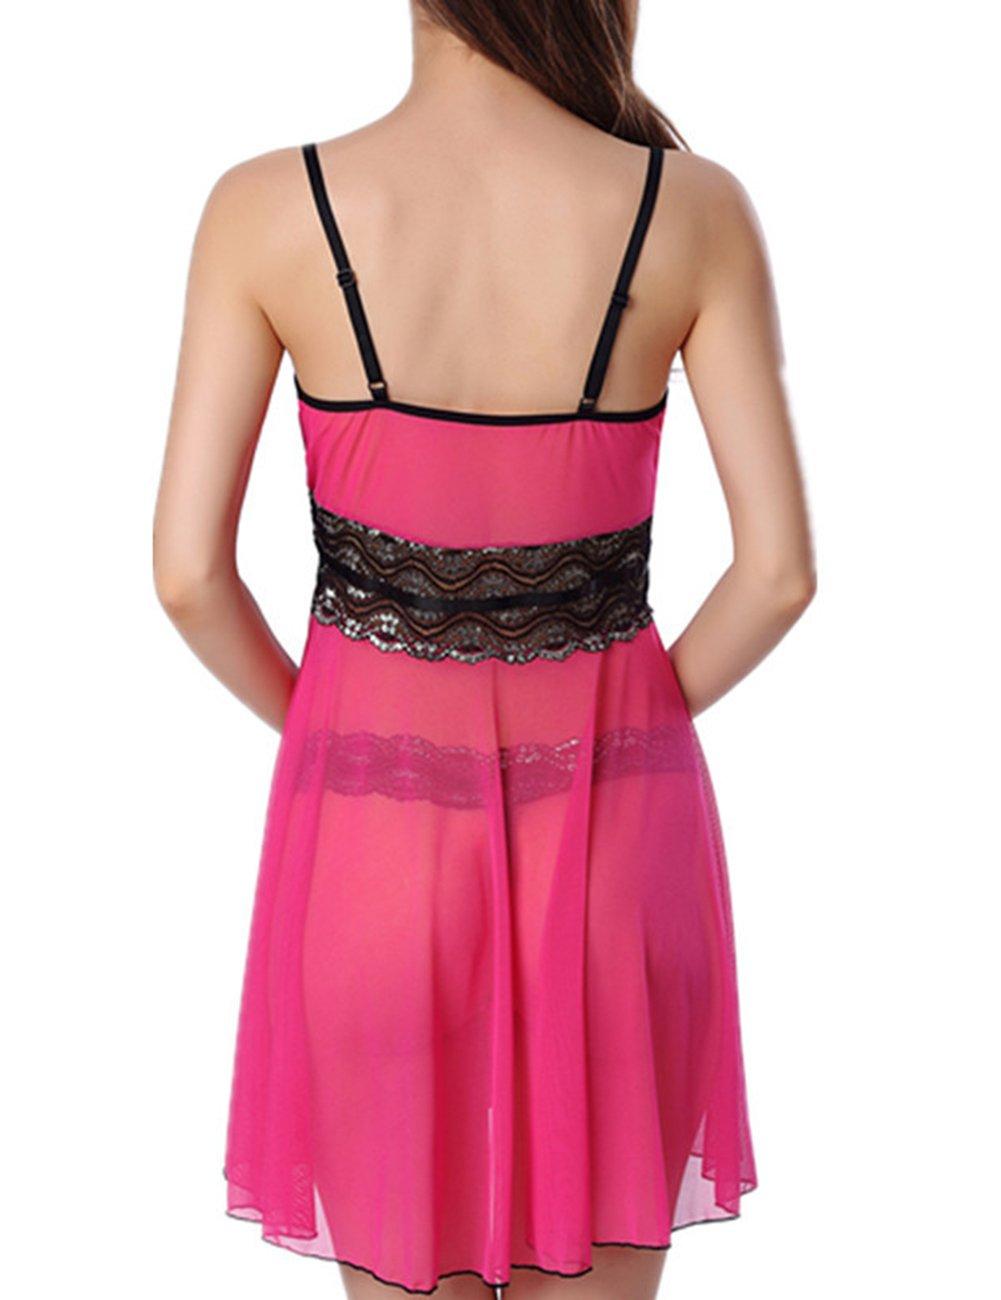 d9a9acbc6 Yiwa 2PCS Sexy Gauze Lace Pajamas Set Seductive T-Back   Braces Skirt  Valentine s Gift Flirting Sex Toy  Amazon.ca  Health   Personal Care